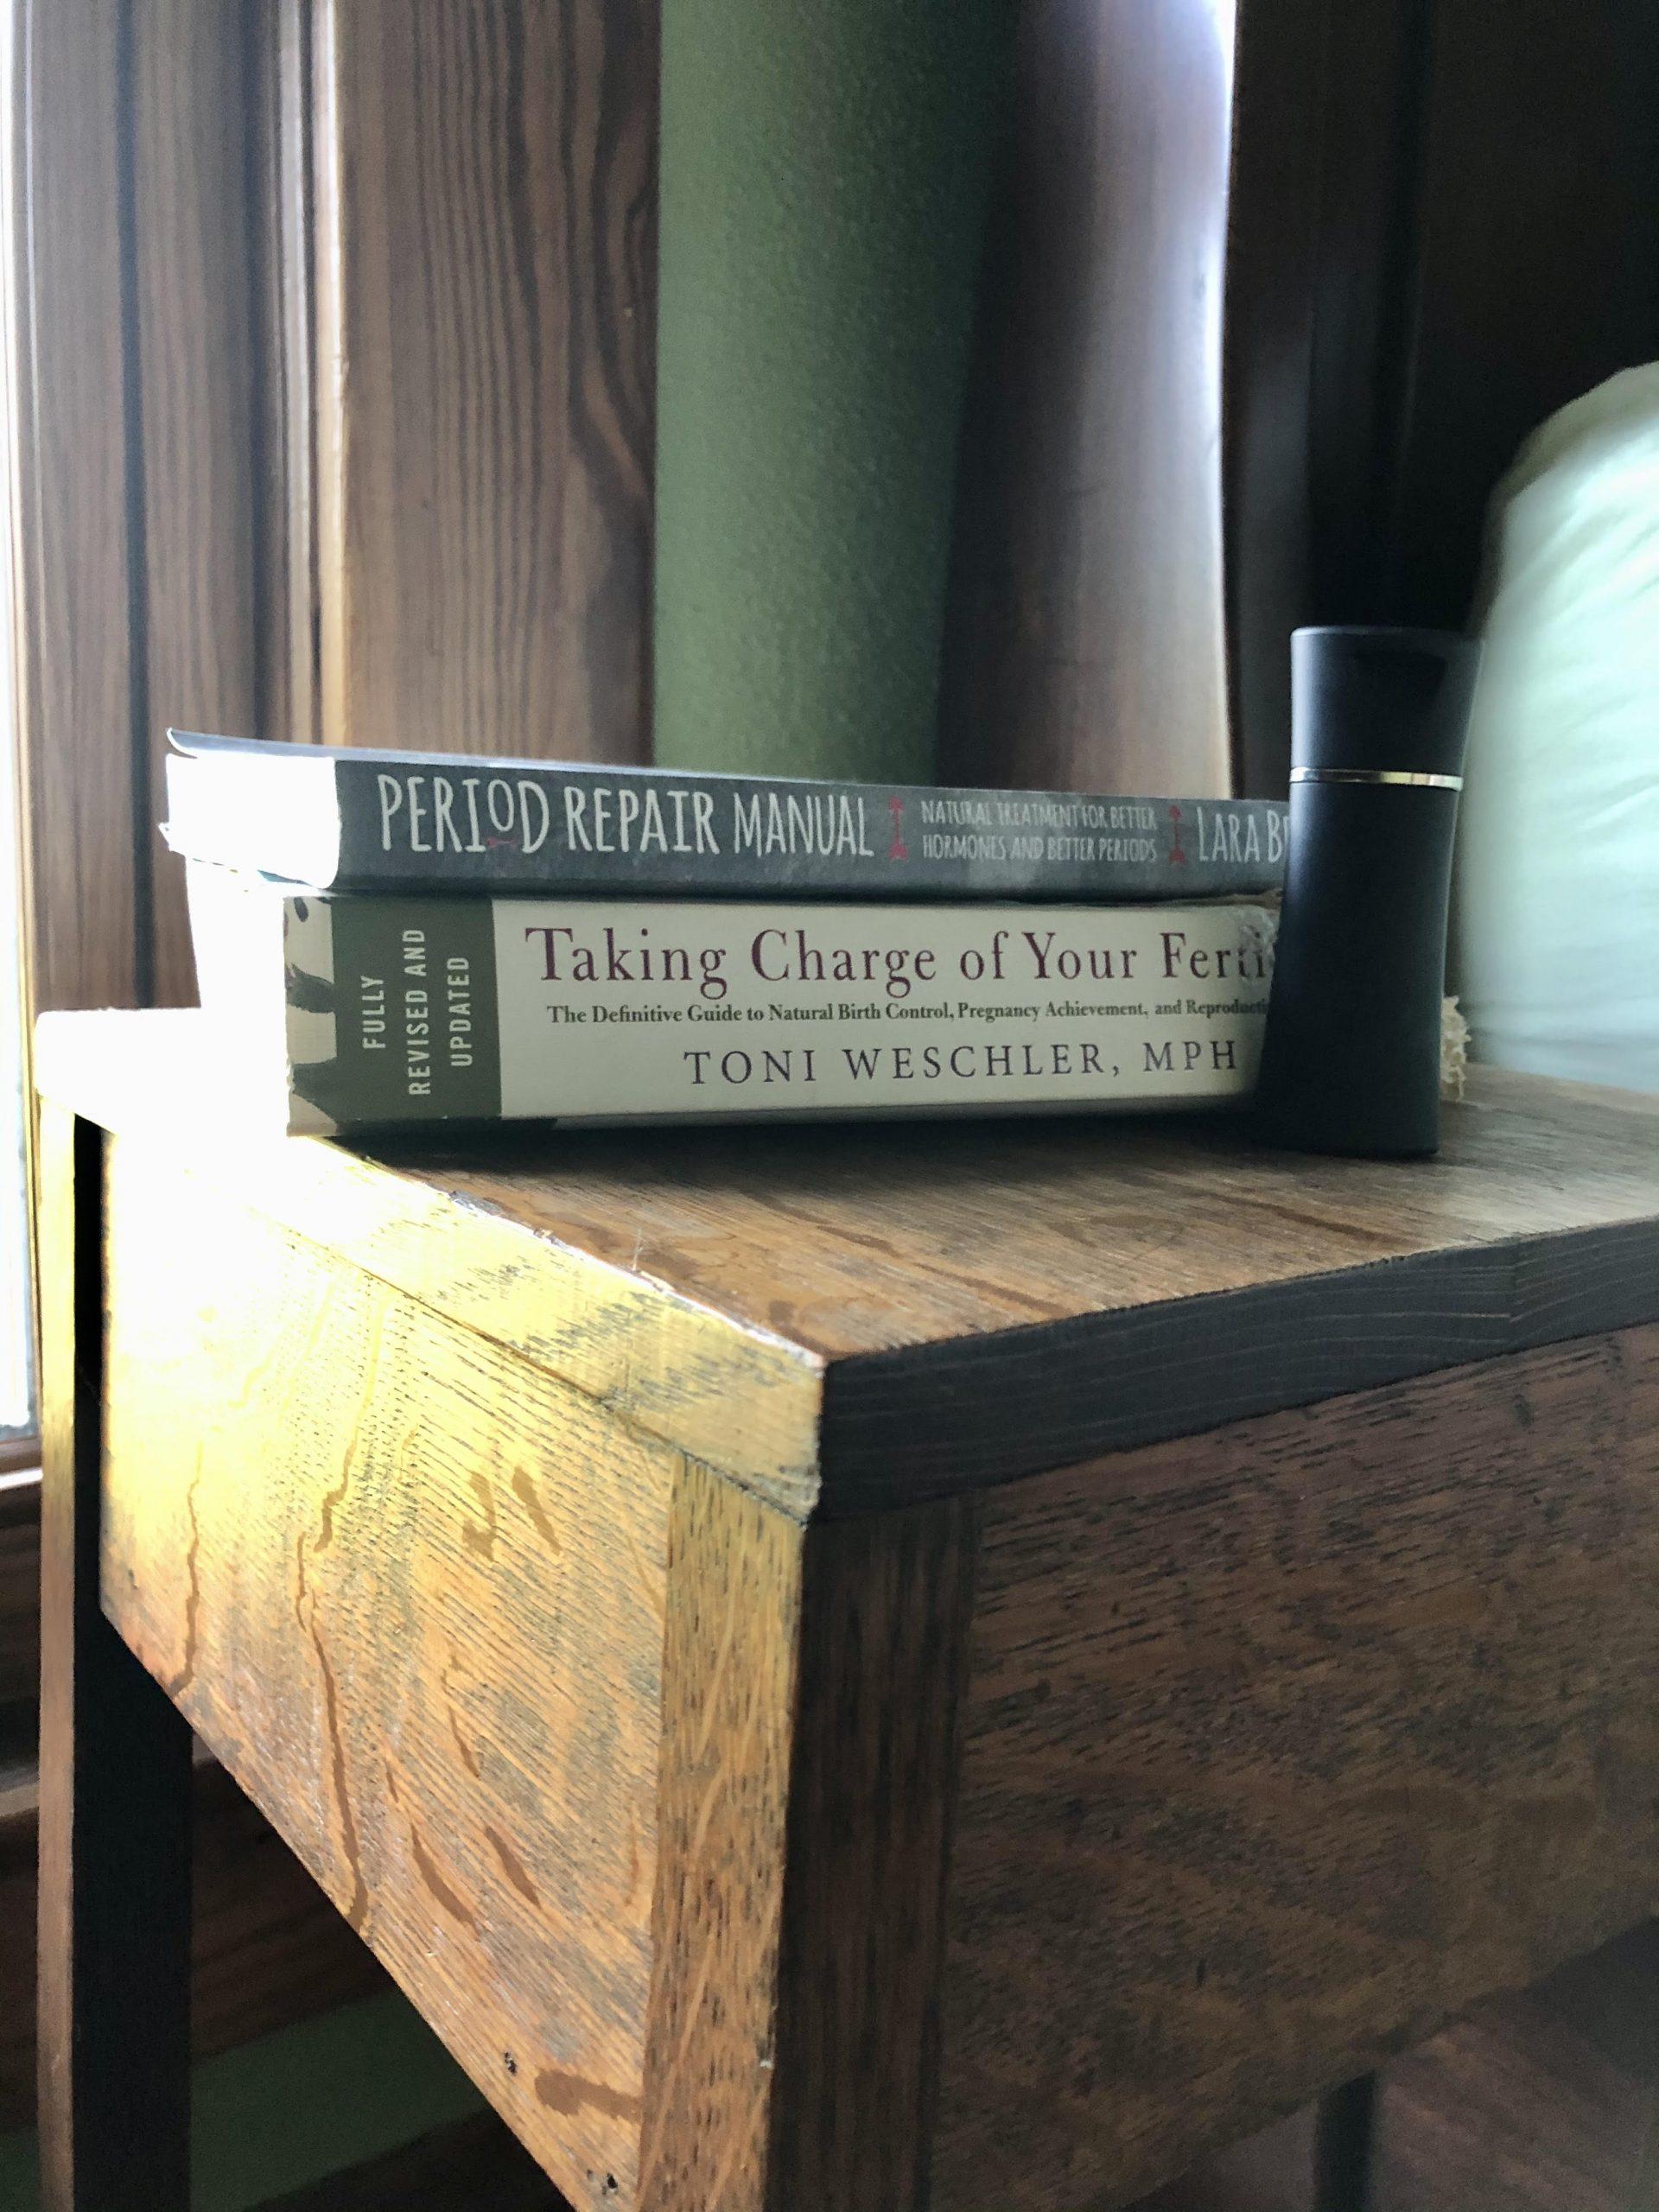 birth control books on a nightstand